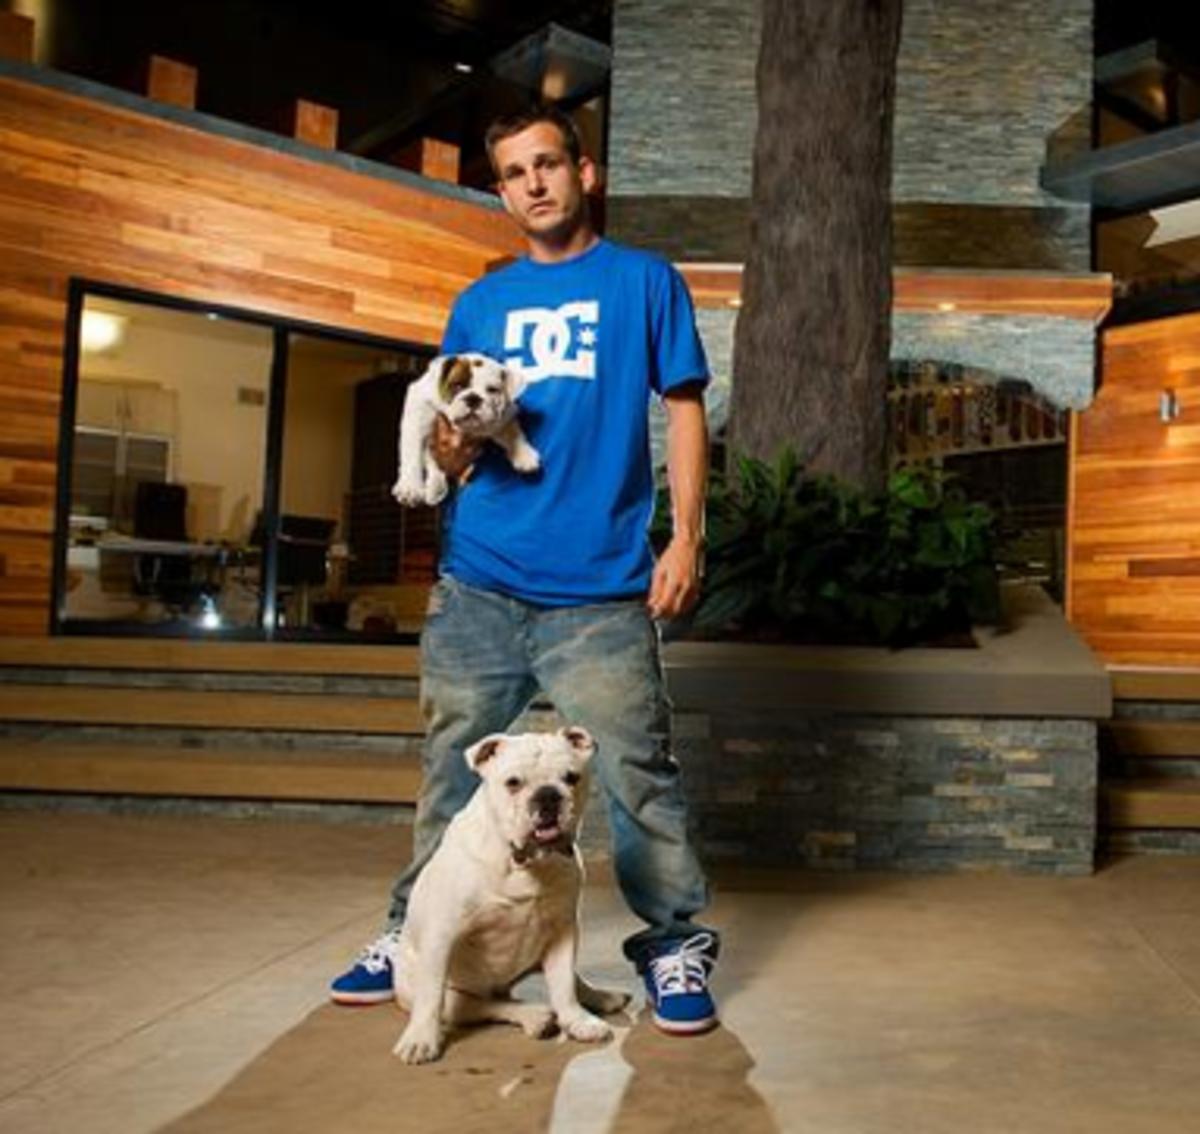 Rob Dyrdek: Professional Skateboarder & Entrepreneur